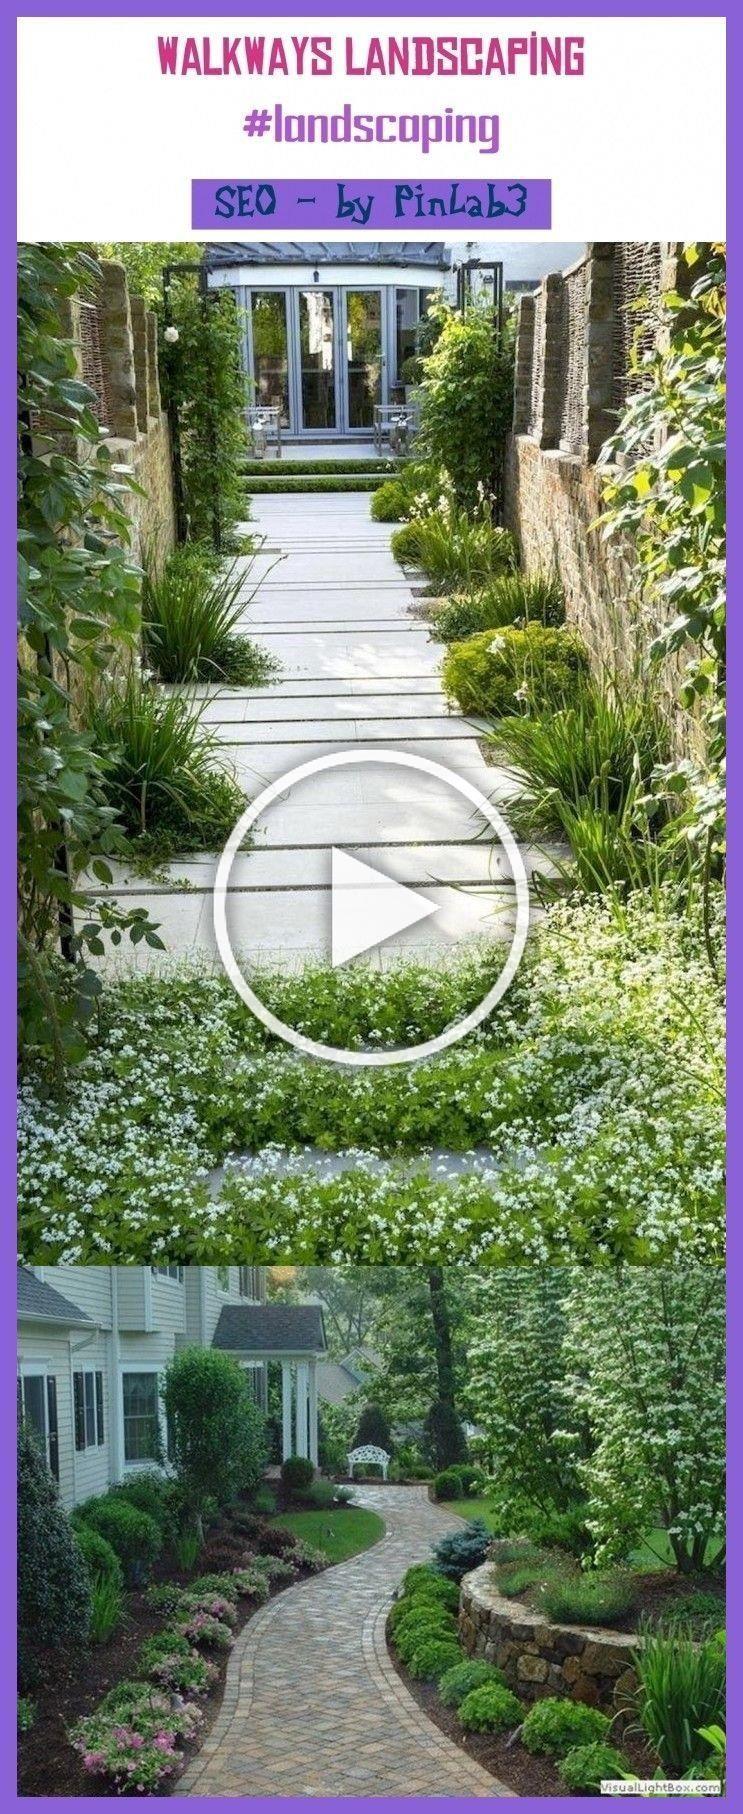 Photo of Walkways landscaping #walkways #landscaping #gehwege #landschaftsbau #aménageme…